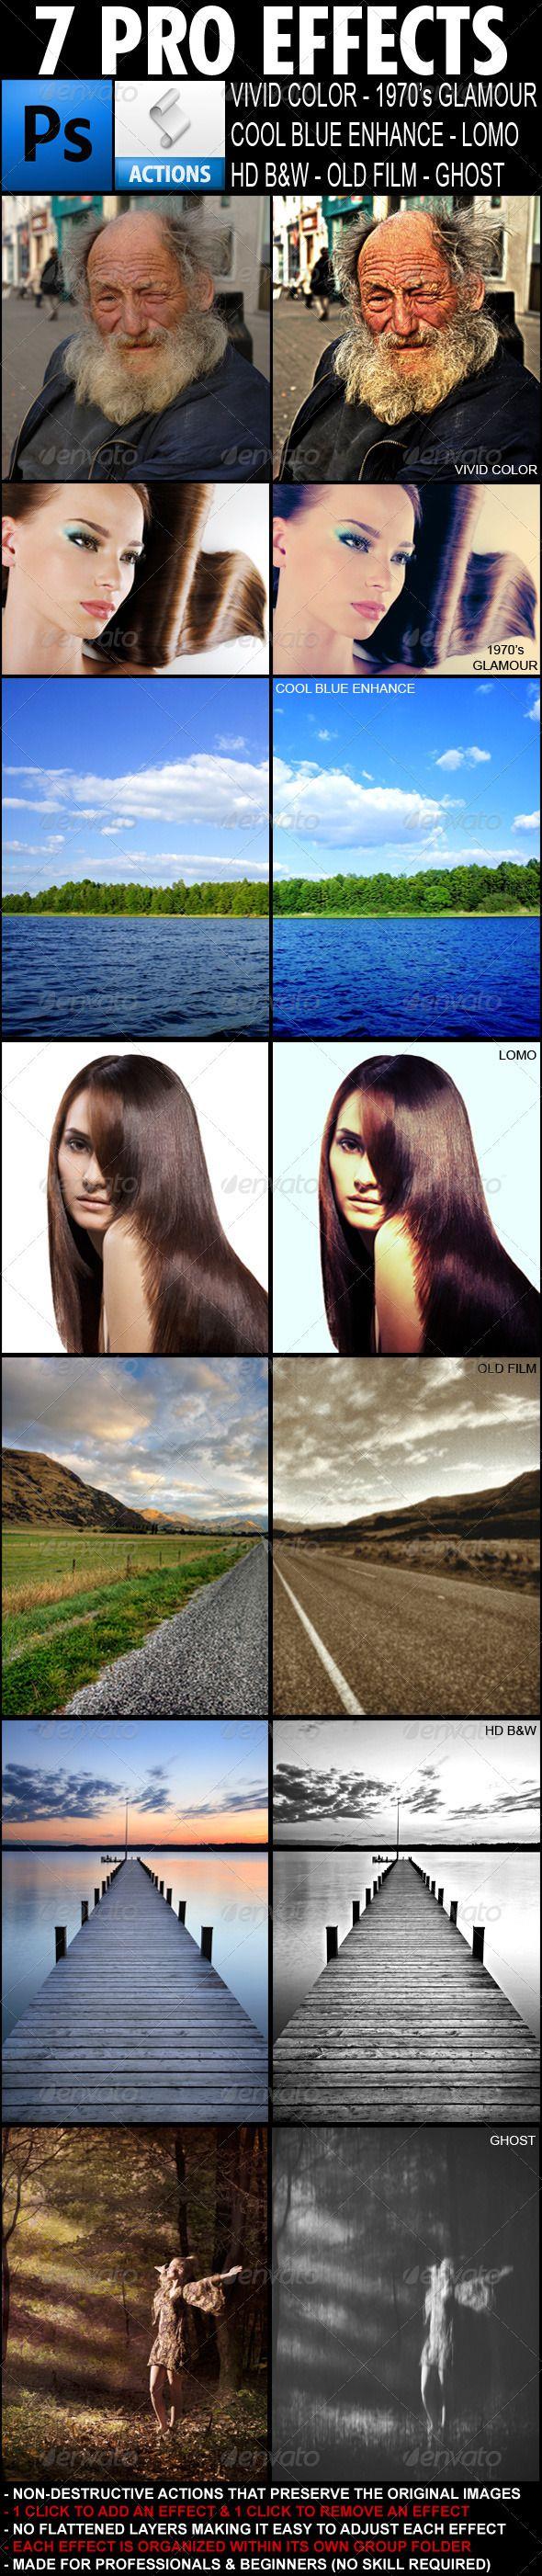 7 Pro Photo Effects